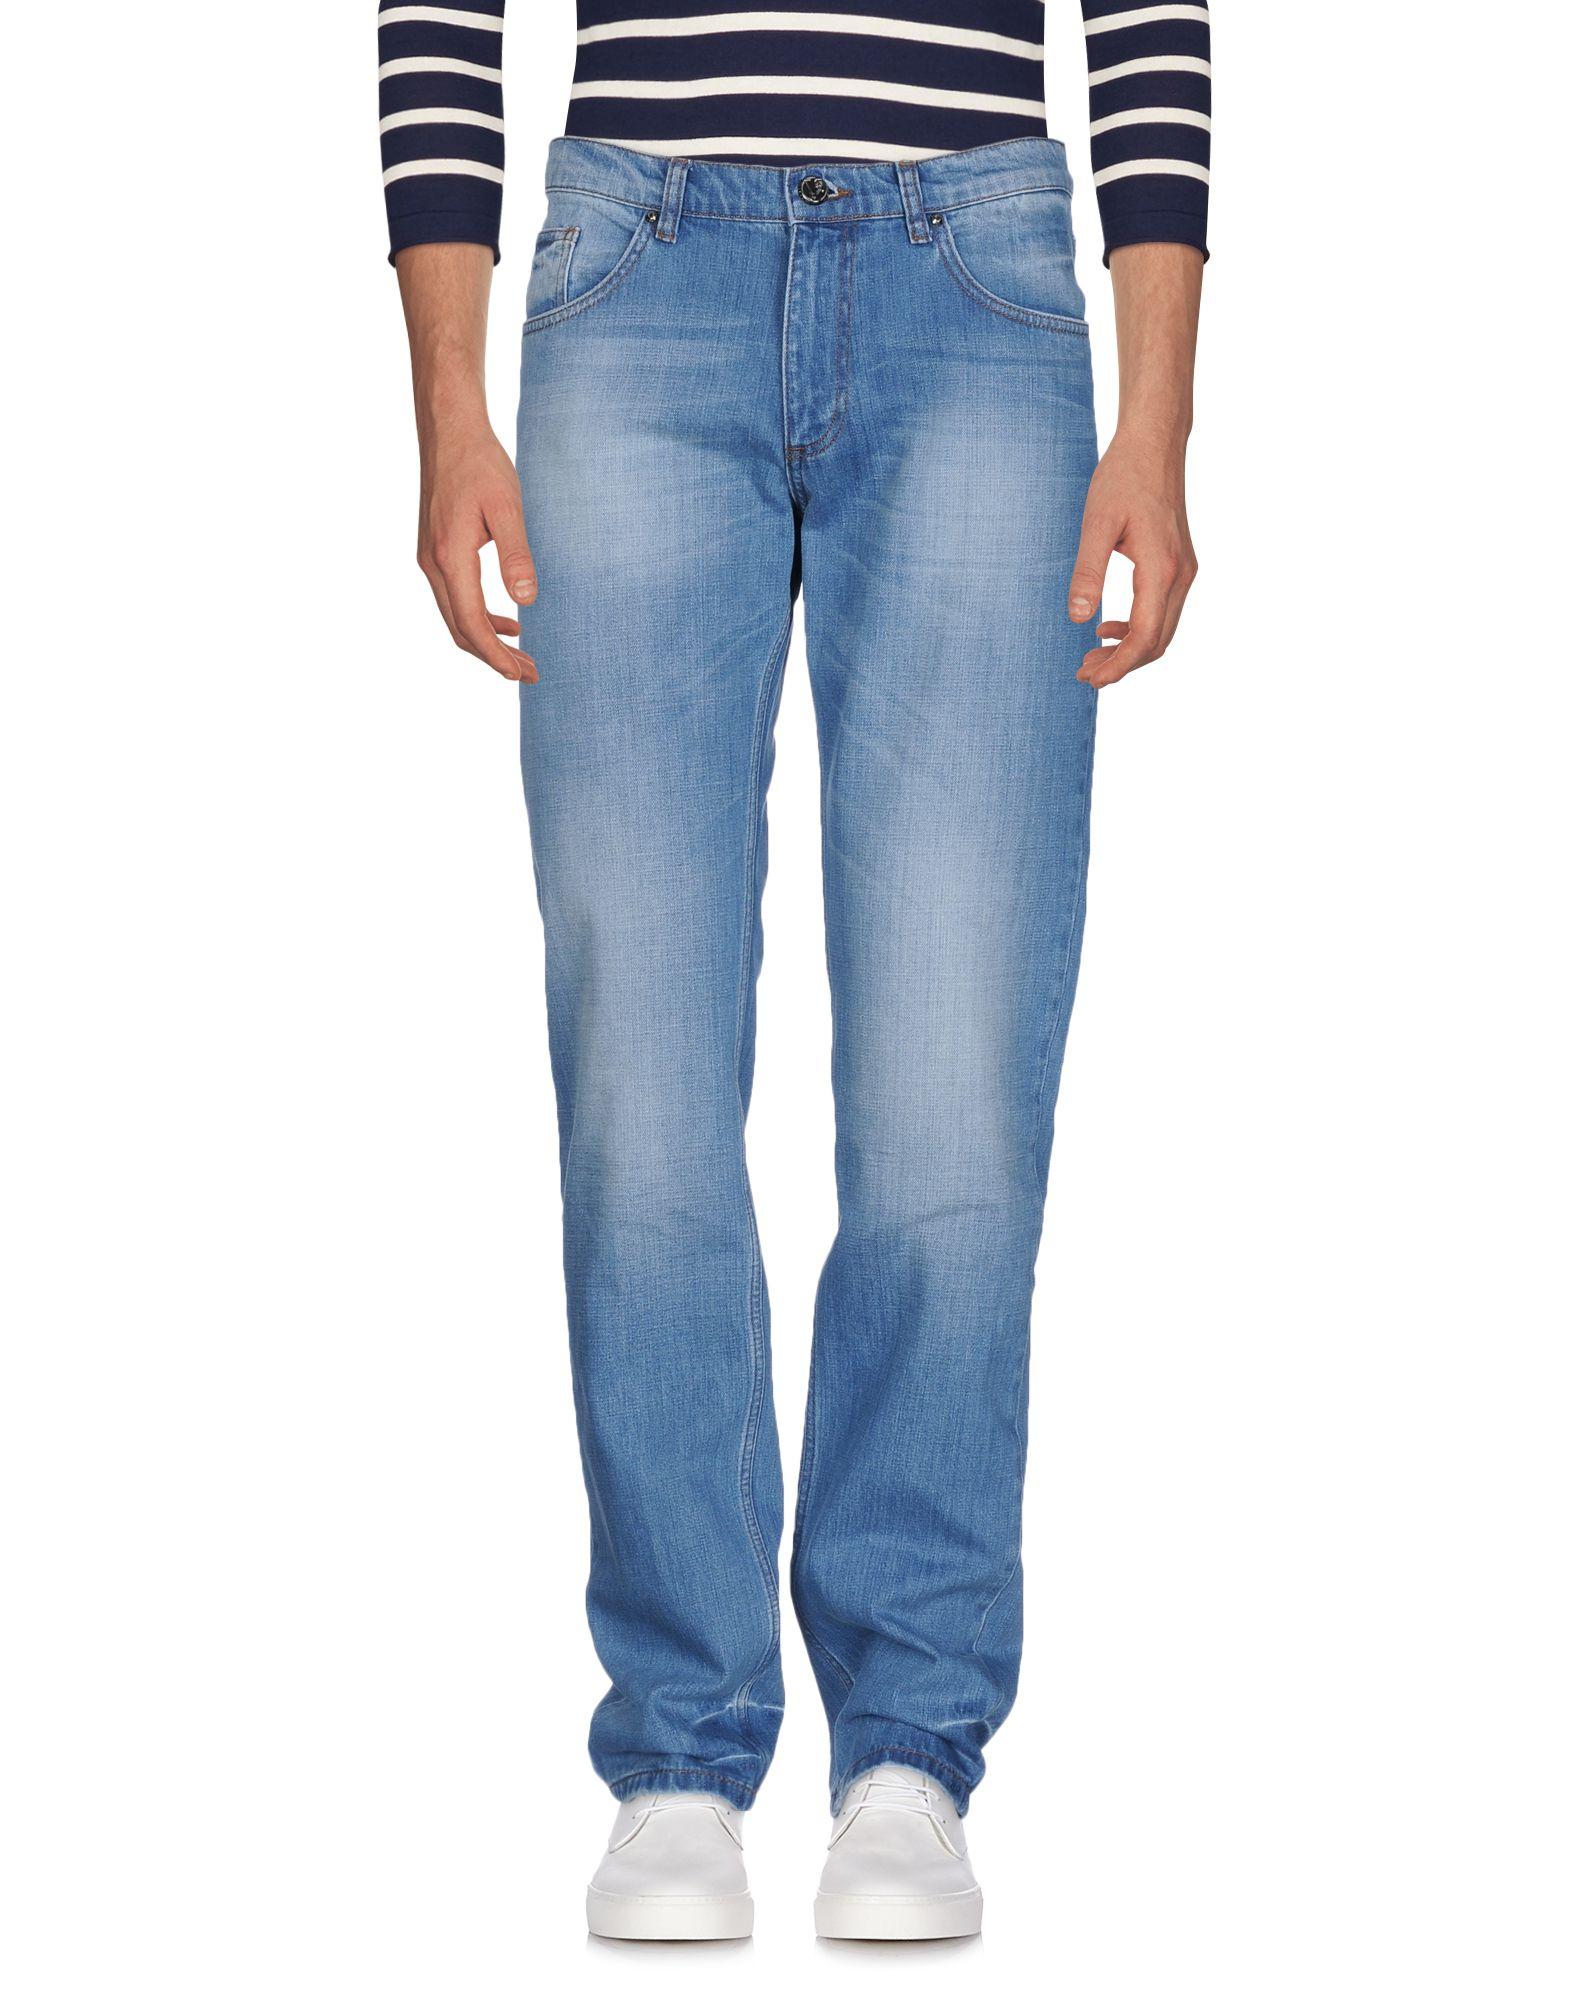 Pantaloni Jeans Versace Uomo Jeans Uomo Versace - 42657714LC fff9c0